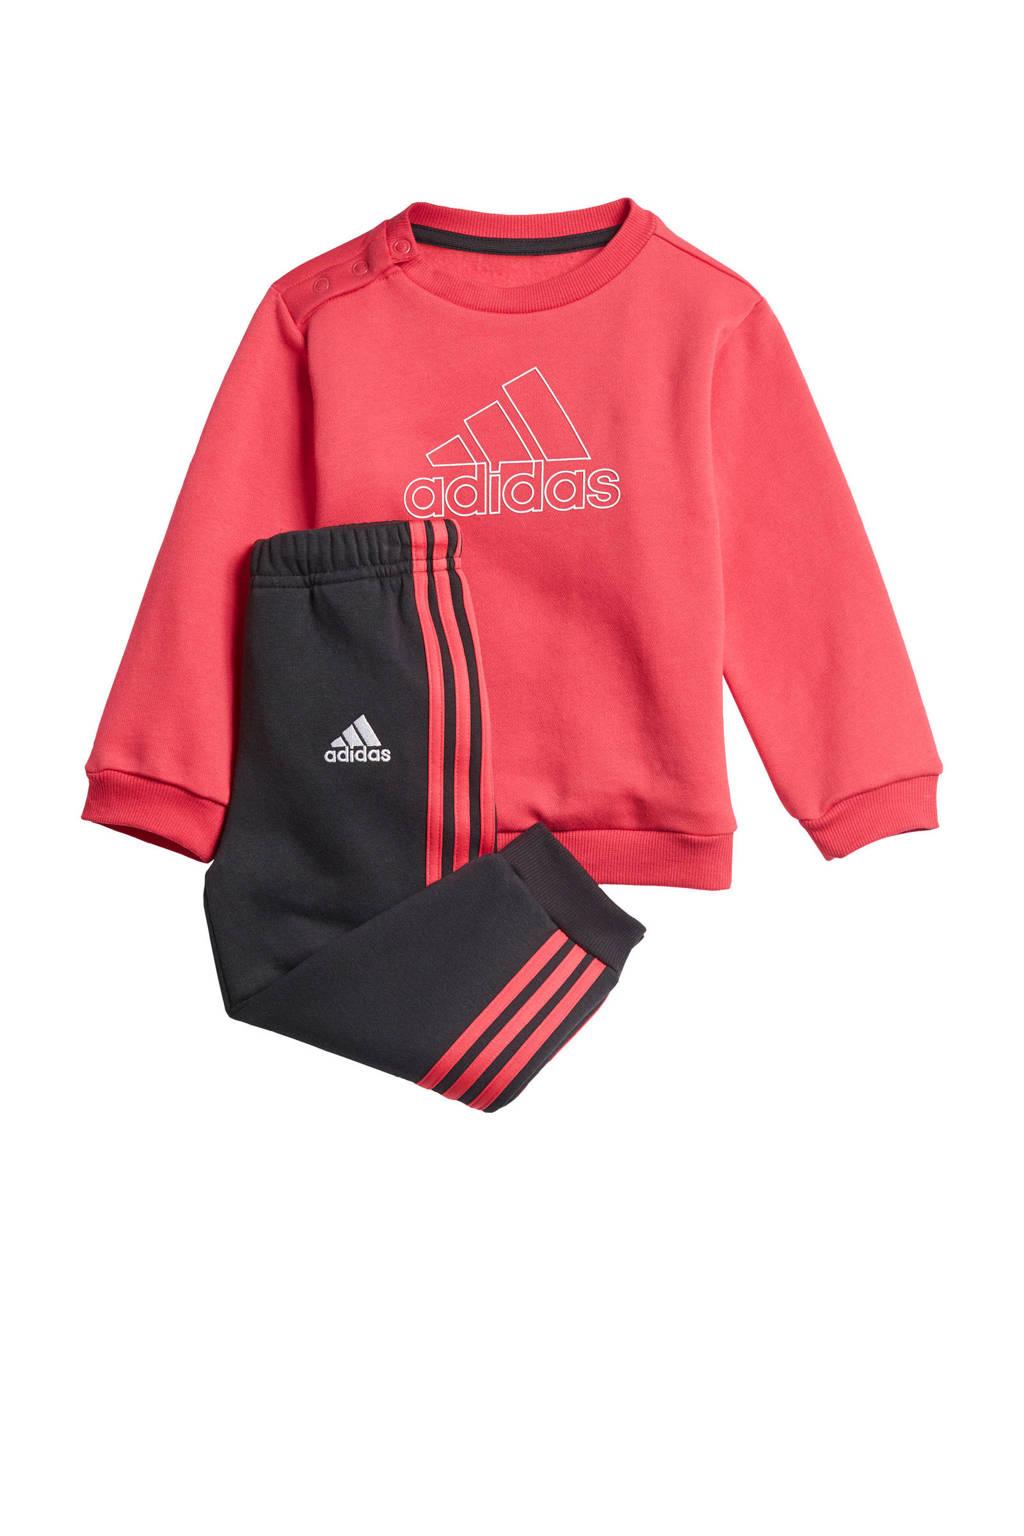 adidas Performance trainingspak roze/zwart, Roze/zwart